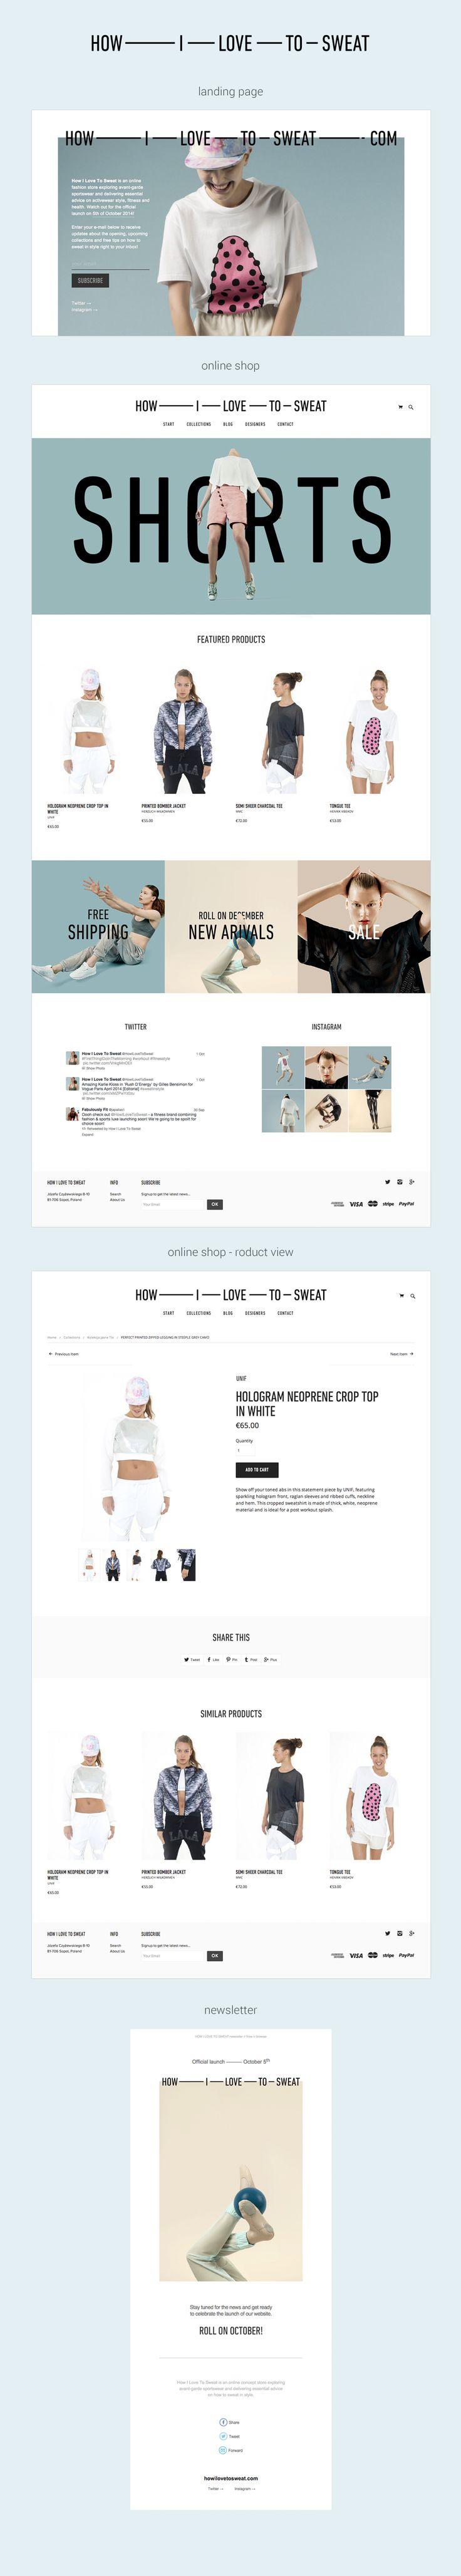 HILTS website and webshop